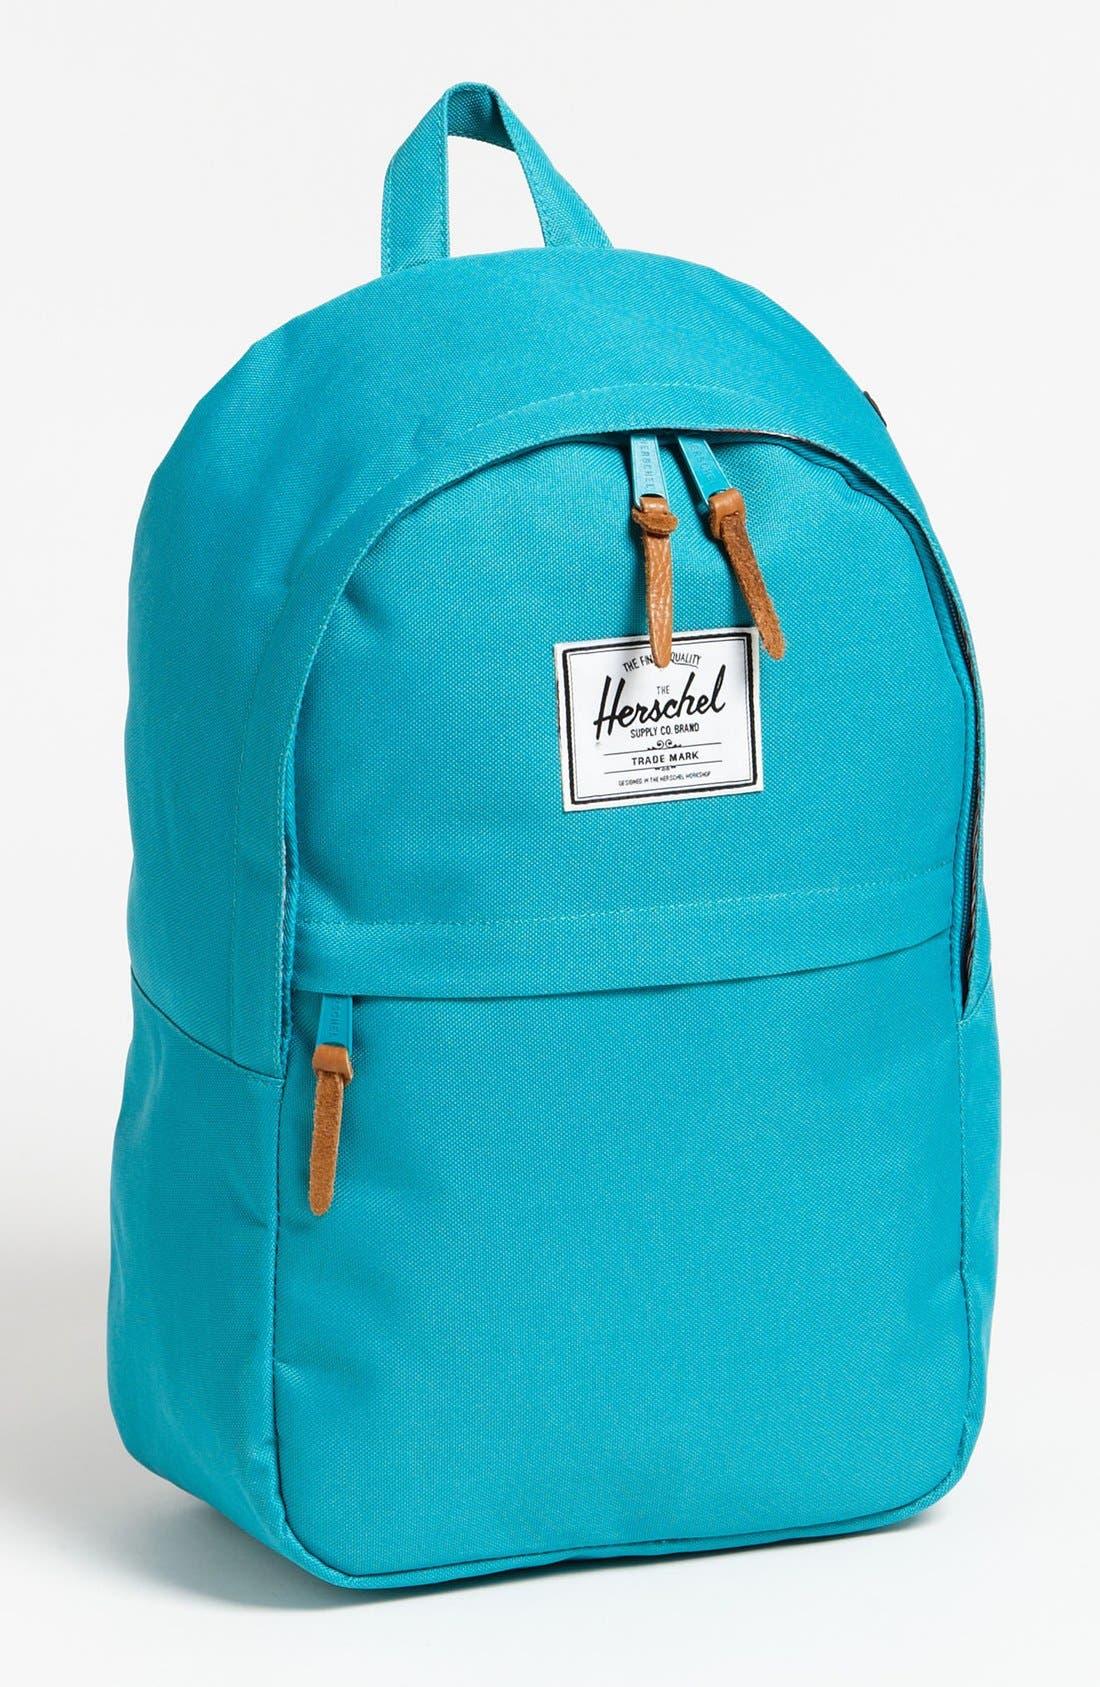 Main Image - Herschel Supply Co. 'Standard' Backpack